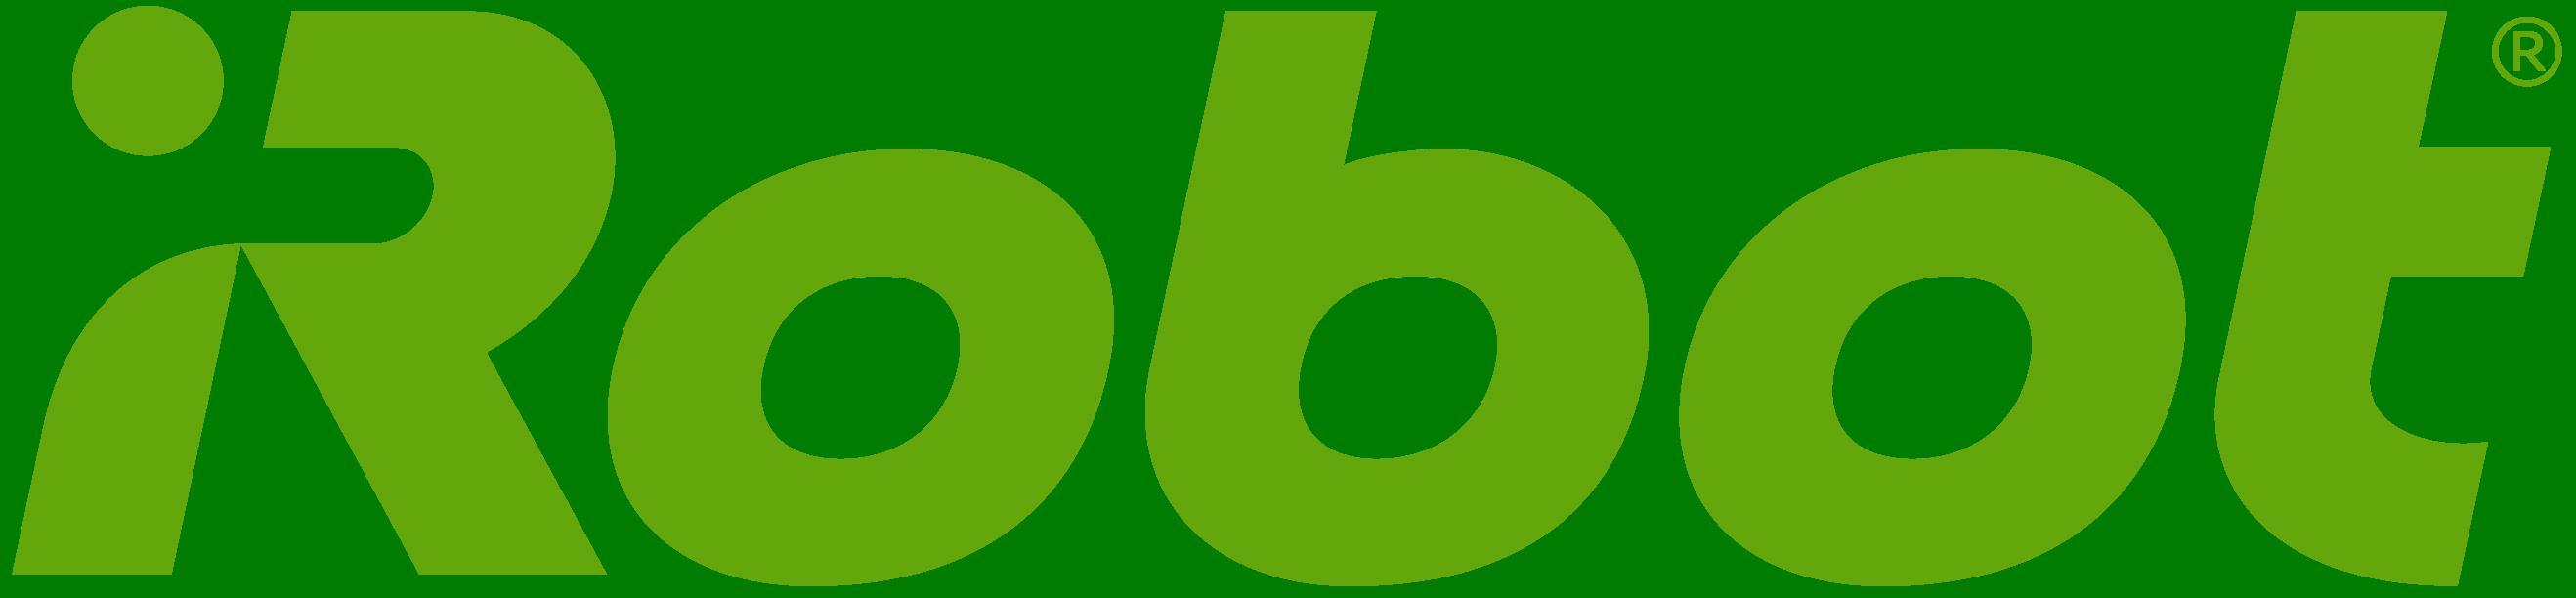 I Robot Green logo